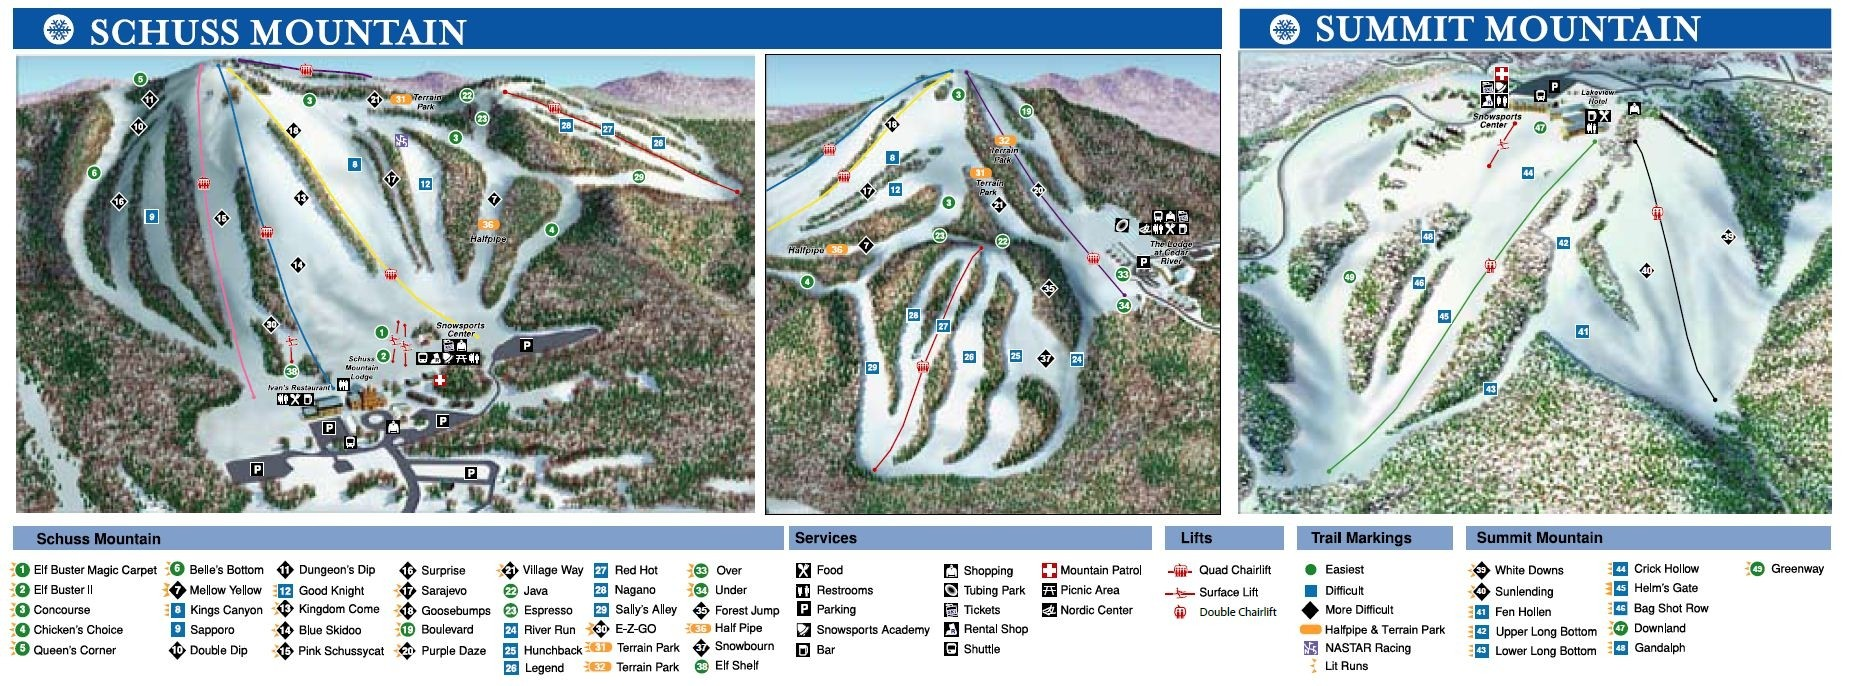 shanty creek resort trail map • piste map • panoramic mountain map